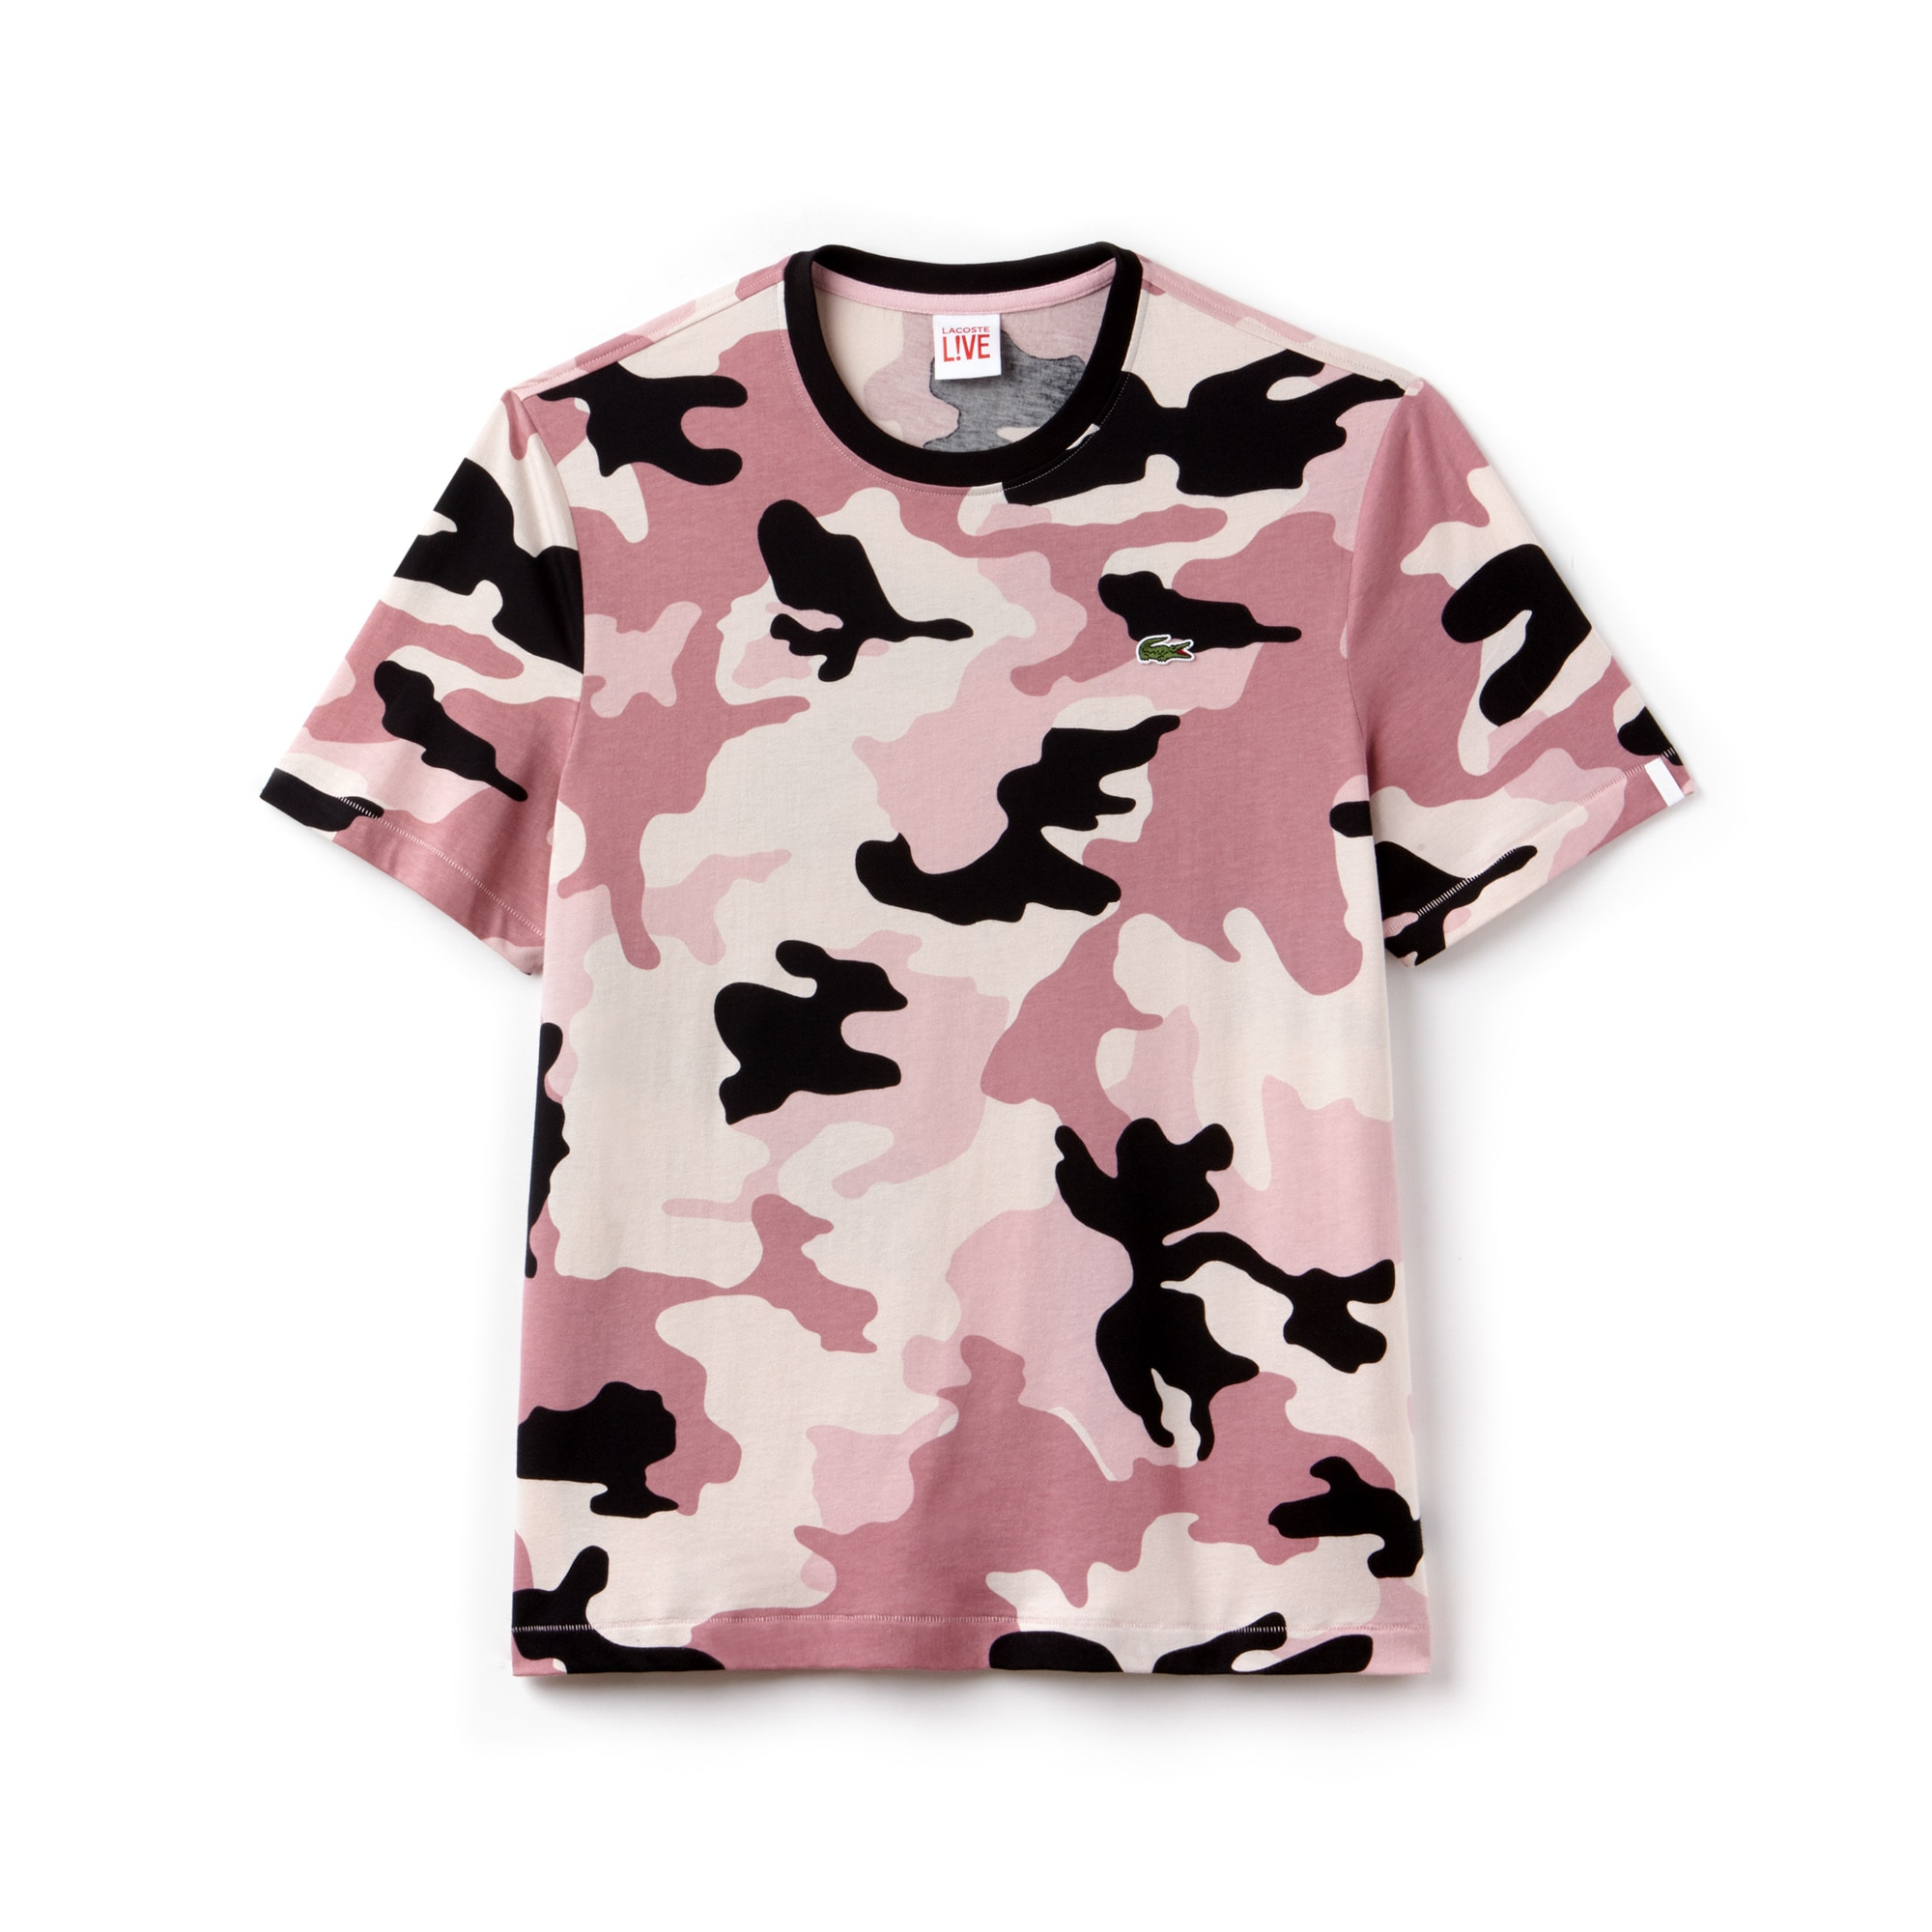 Camiseta Camuflaje Hombre Lacoste Live